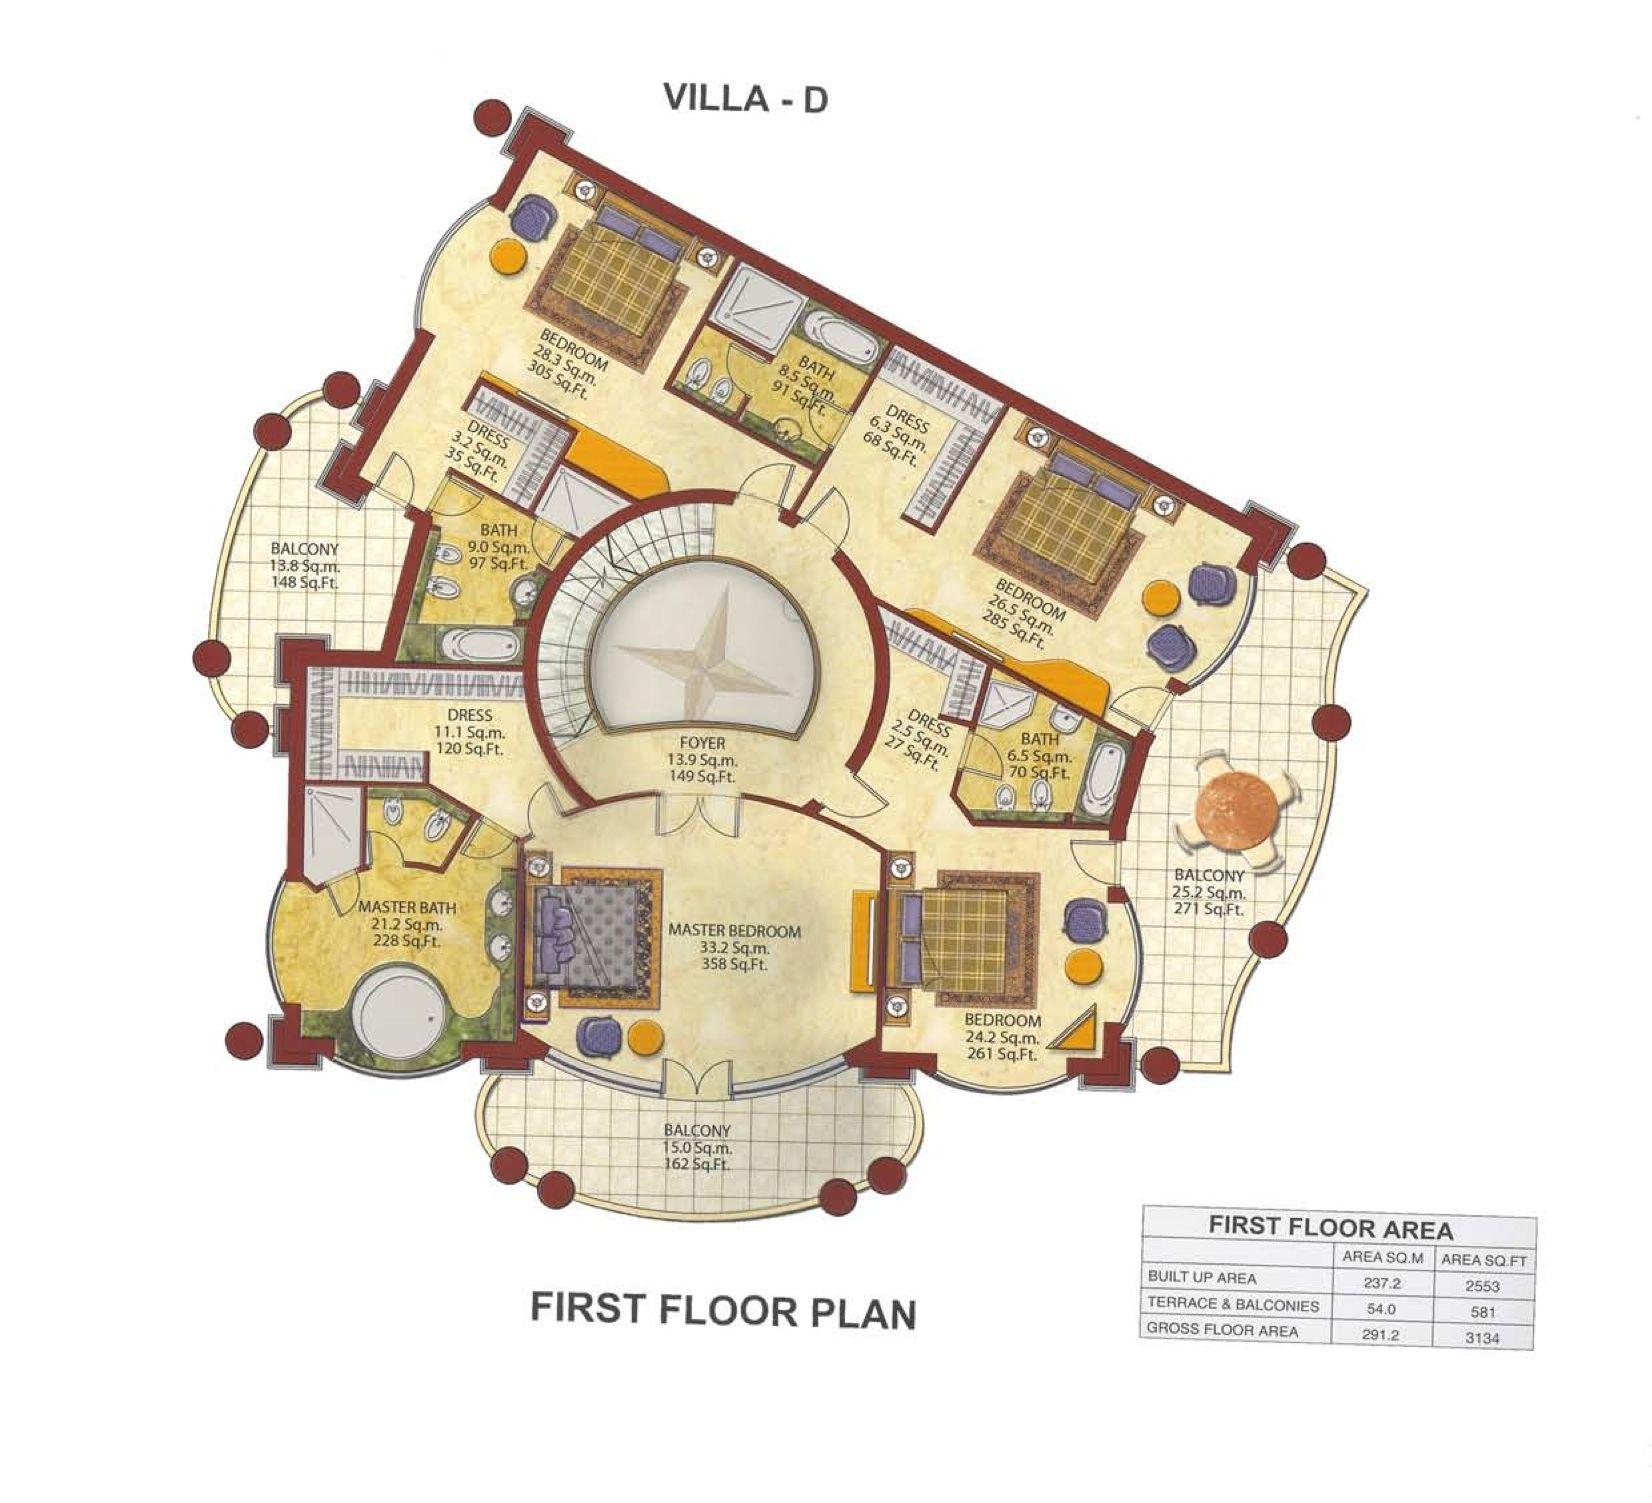 Dubai villas palm jumeirah plans google search res for Dubai house floor plans